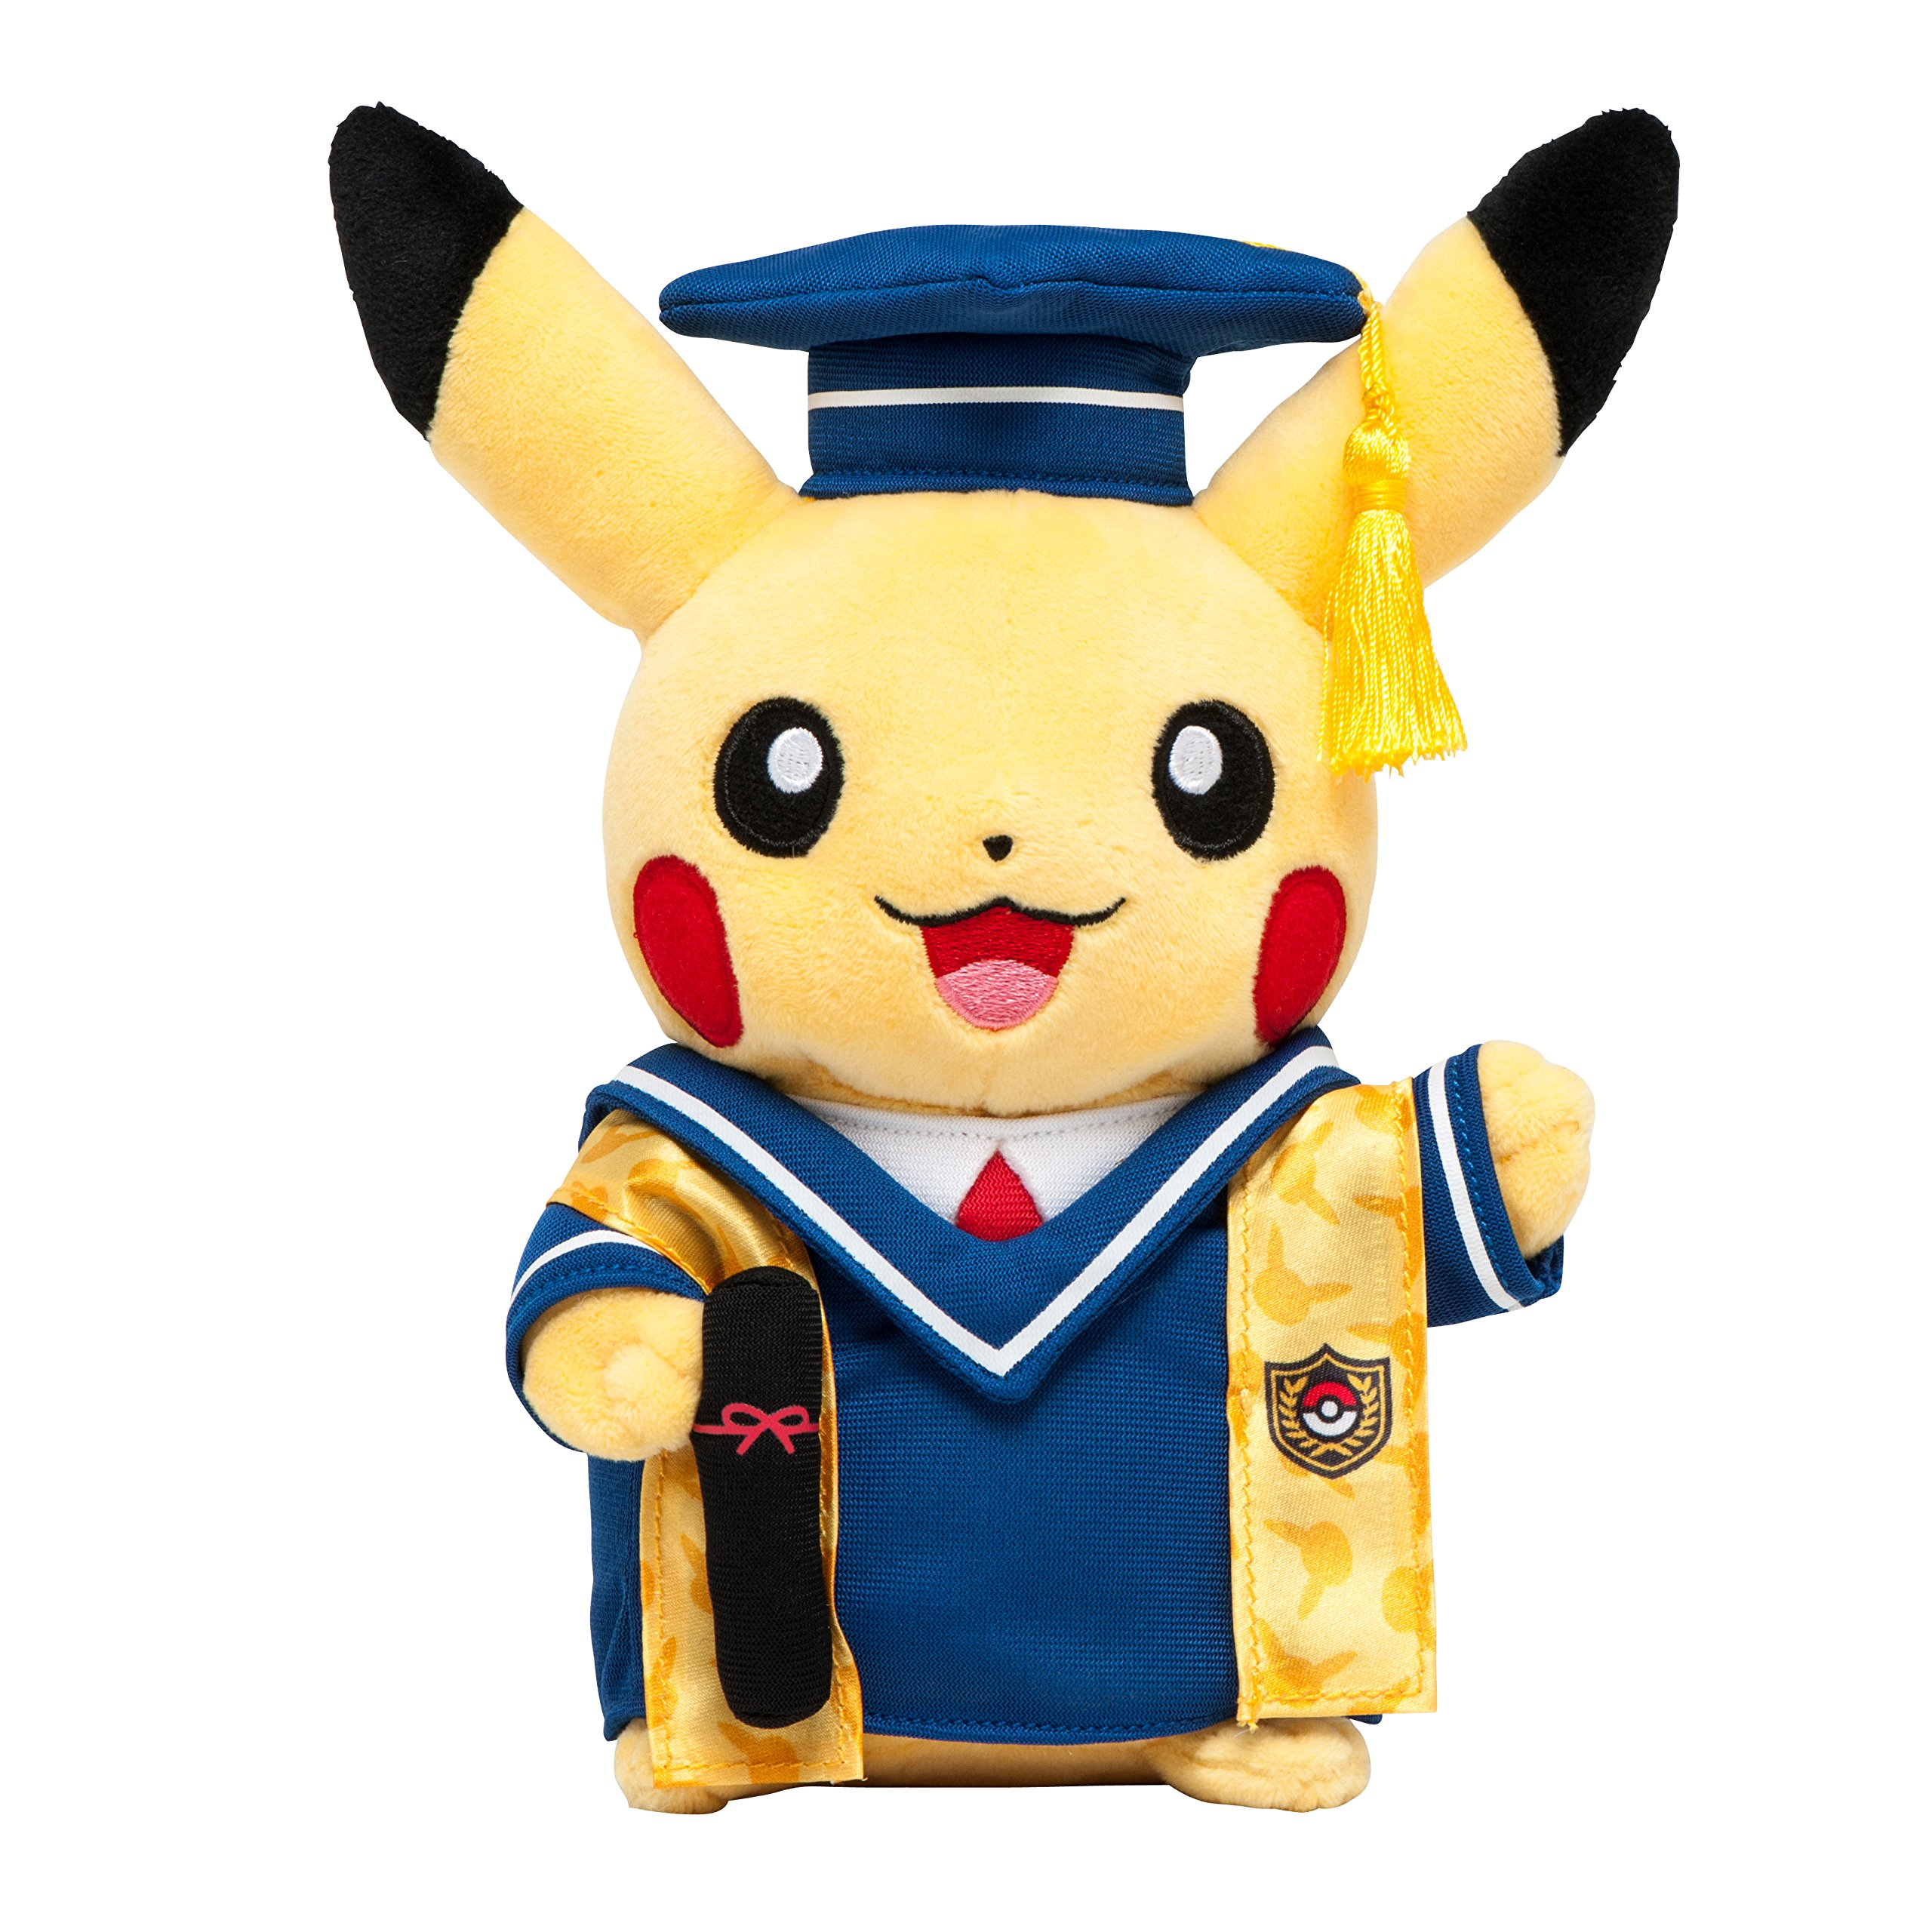 Pokemon Japan Center Original Stuffed Monthly Pikachu 2016 MarchAF27 by Pok????mon by Pokemon